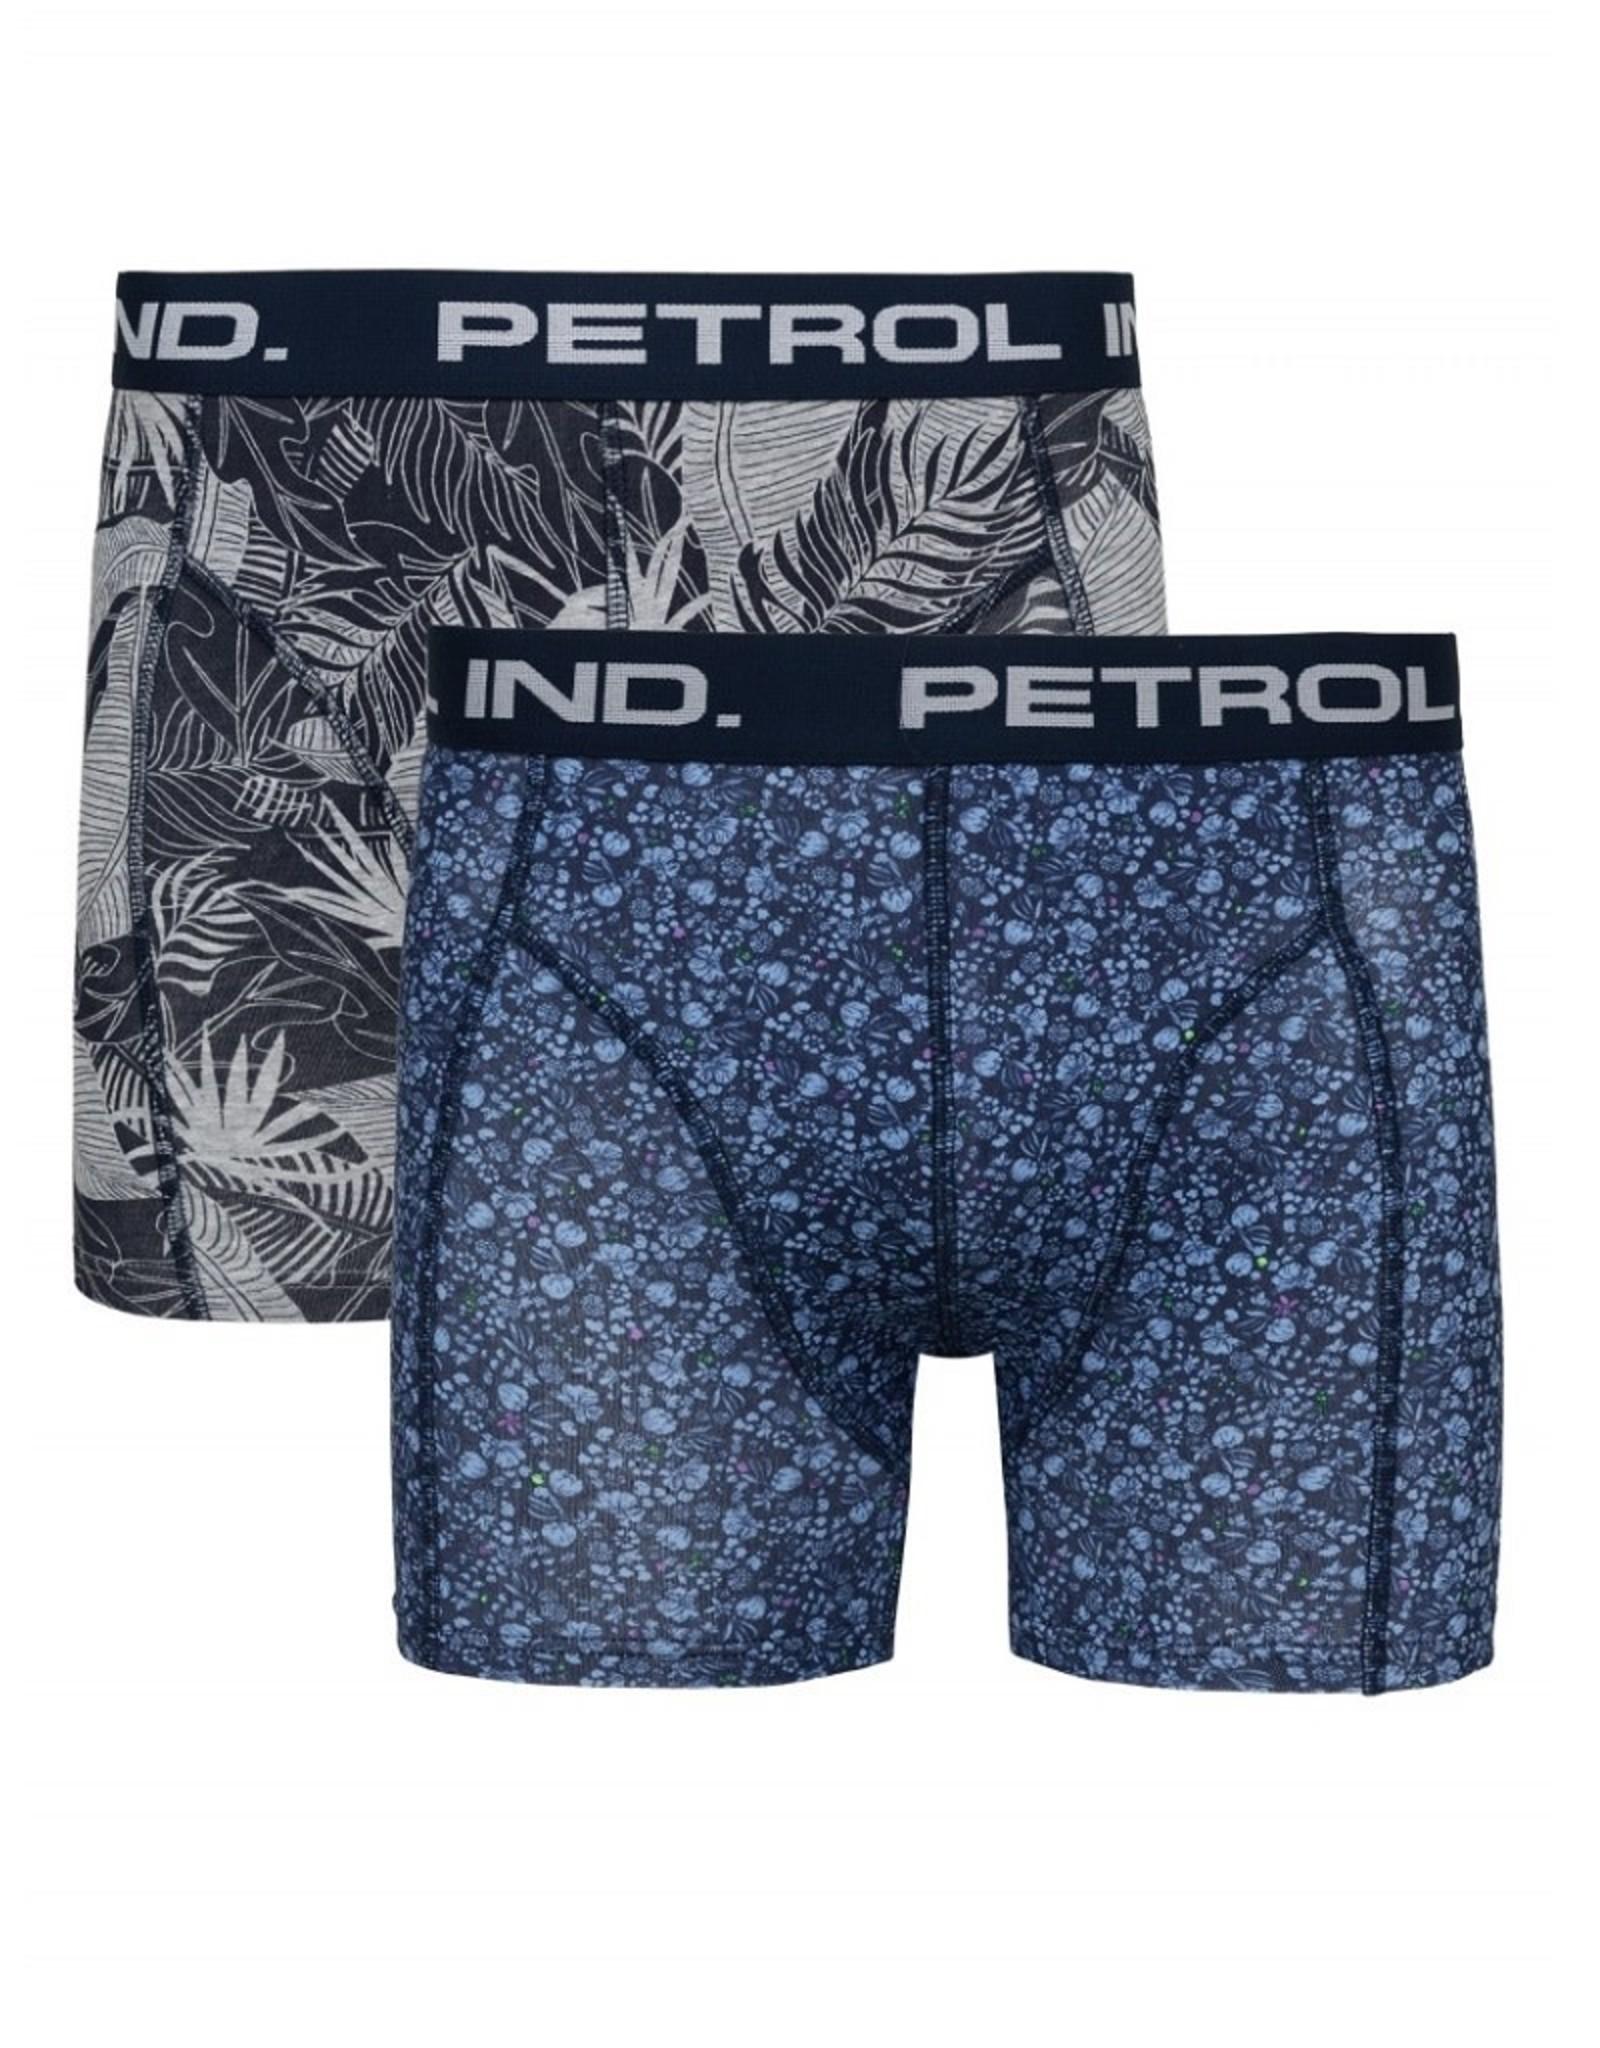 Petrol Ind. Petrol Boxershort 2-PACK Blauw BXR201